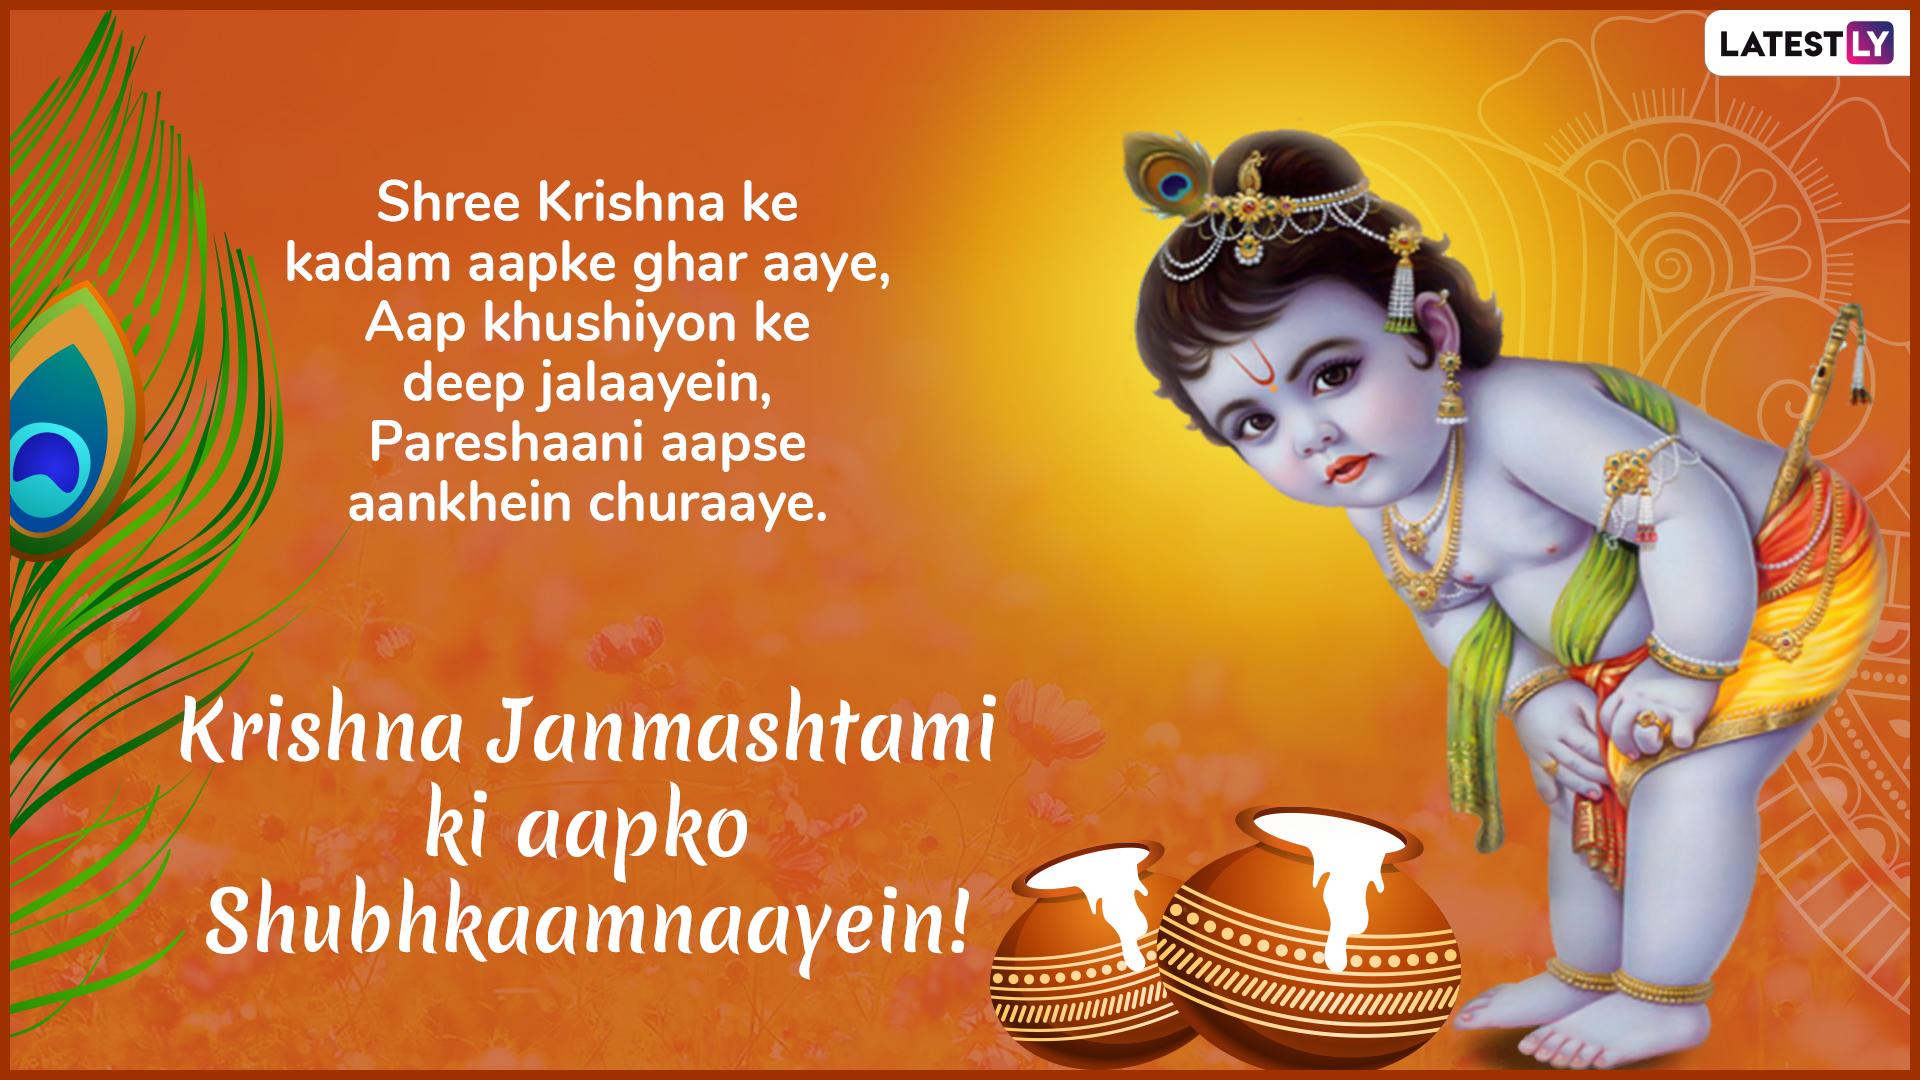 Janmashtami 2019 Hindi Whatsapp Wish 1 (Photo Credits: File Image)